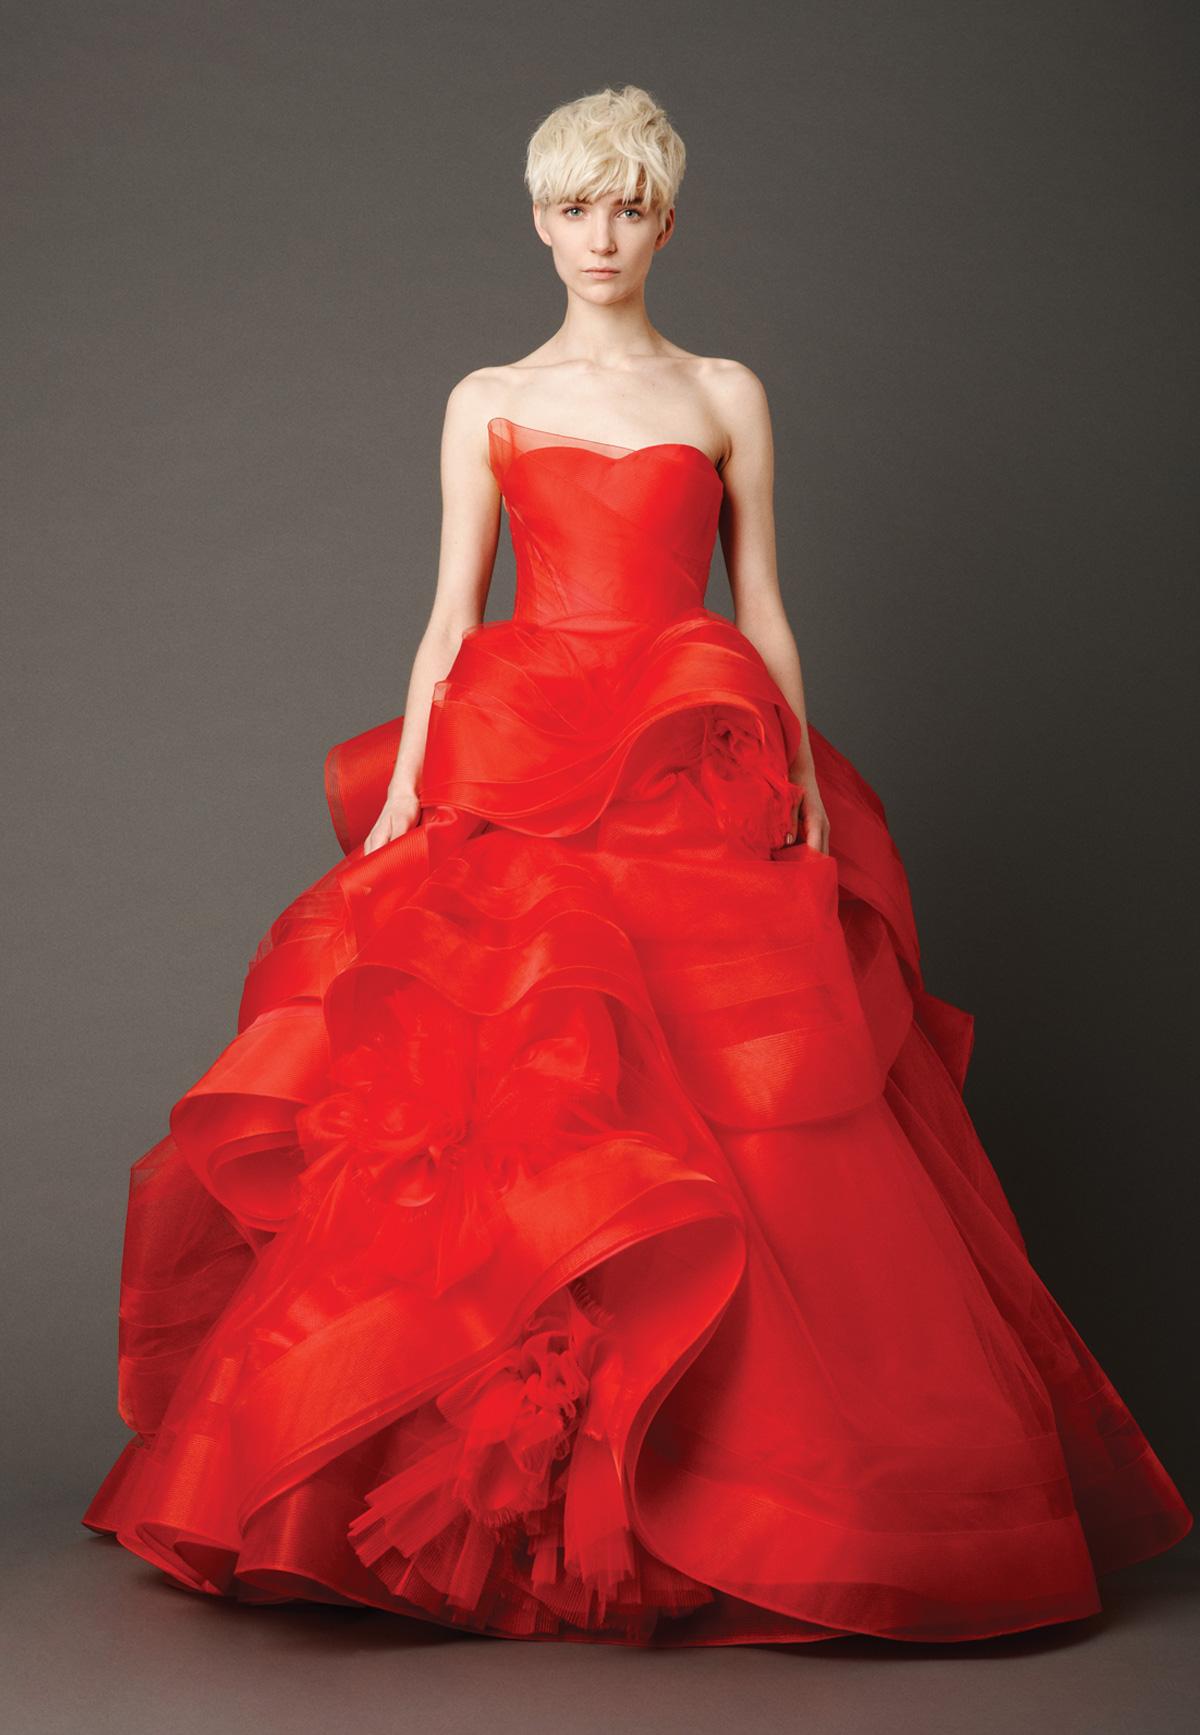 red wedding dresses red dress for wedding Vera Wang Red Wedding Dress